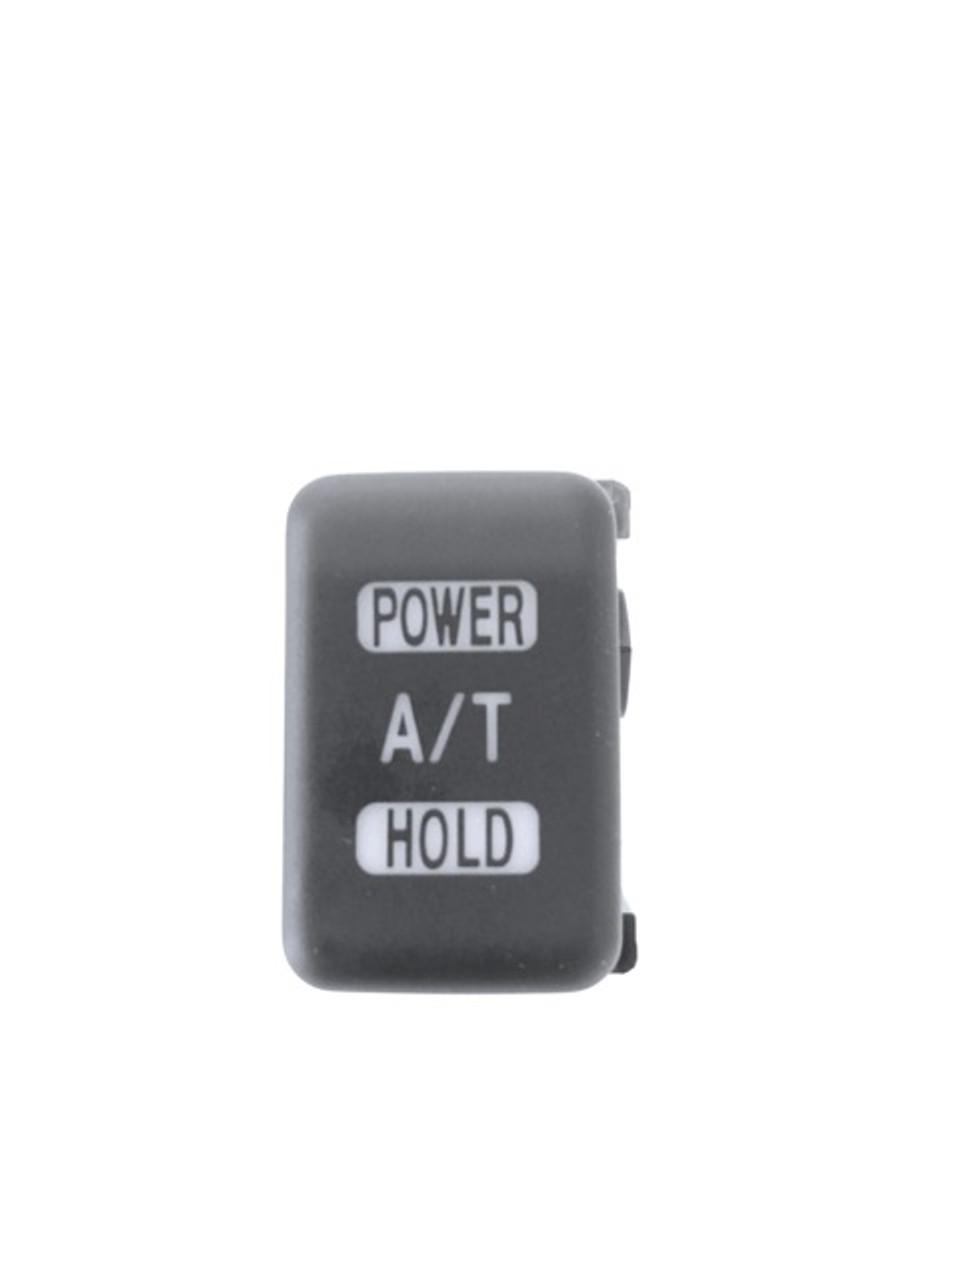 Subaru Transmission Mode Switch at AVOJDM.com